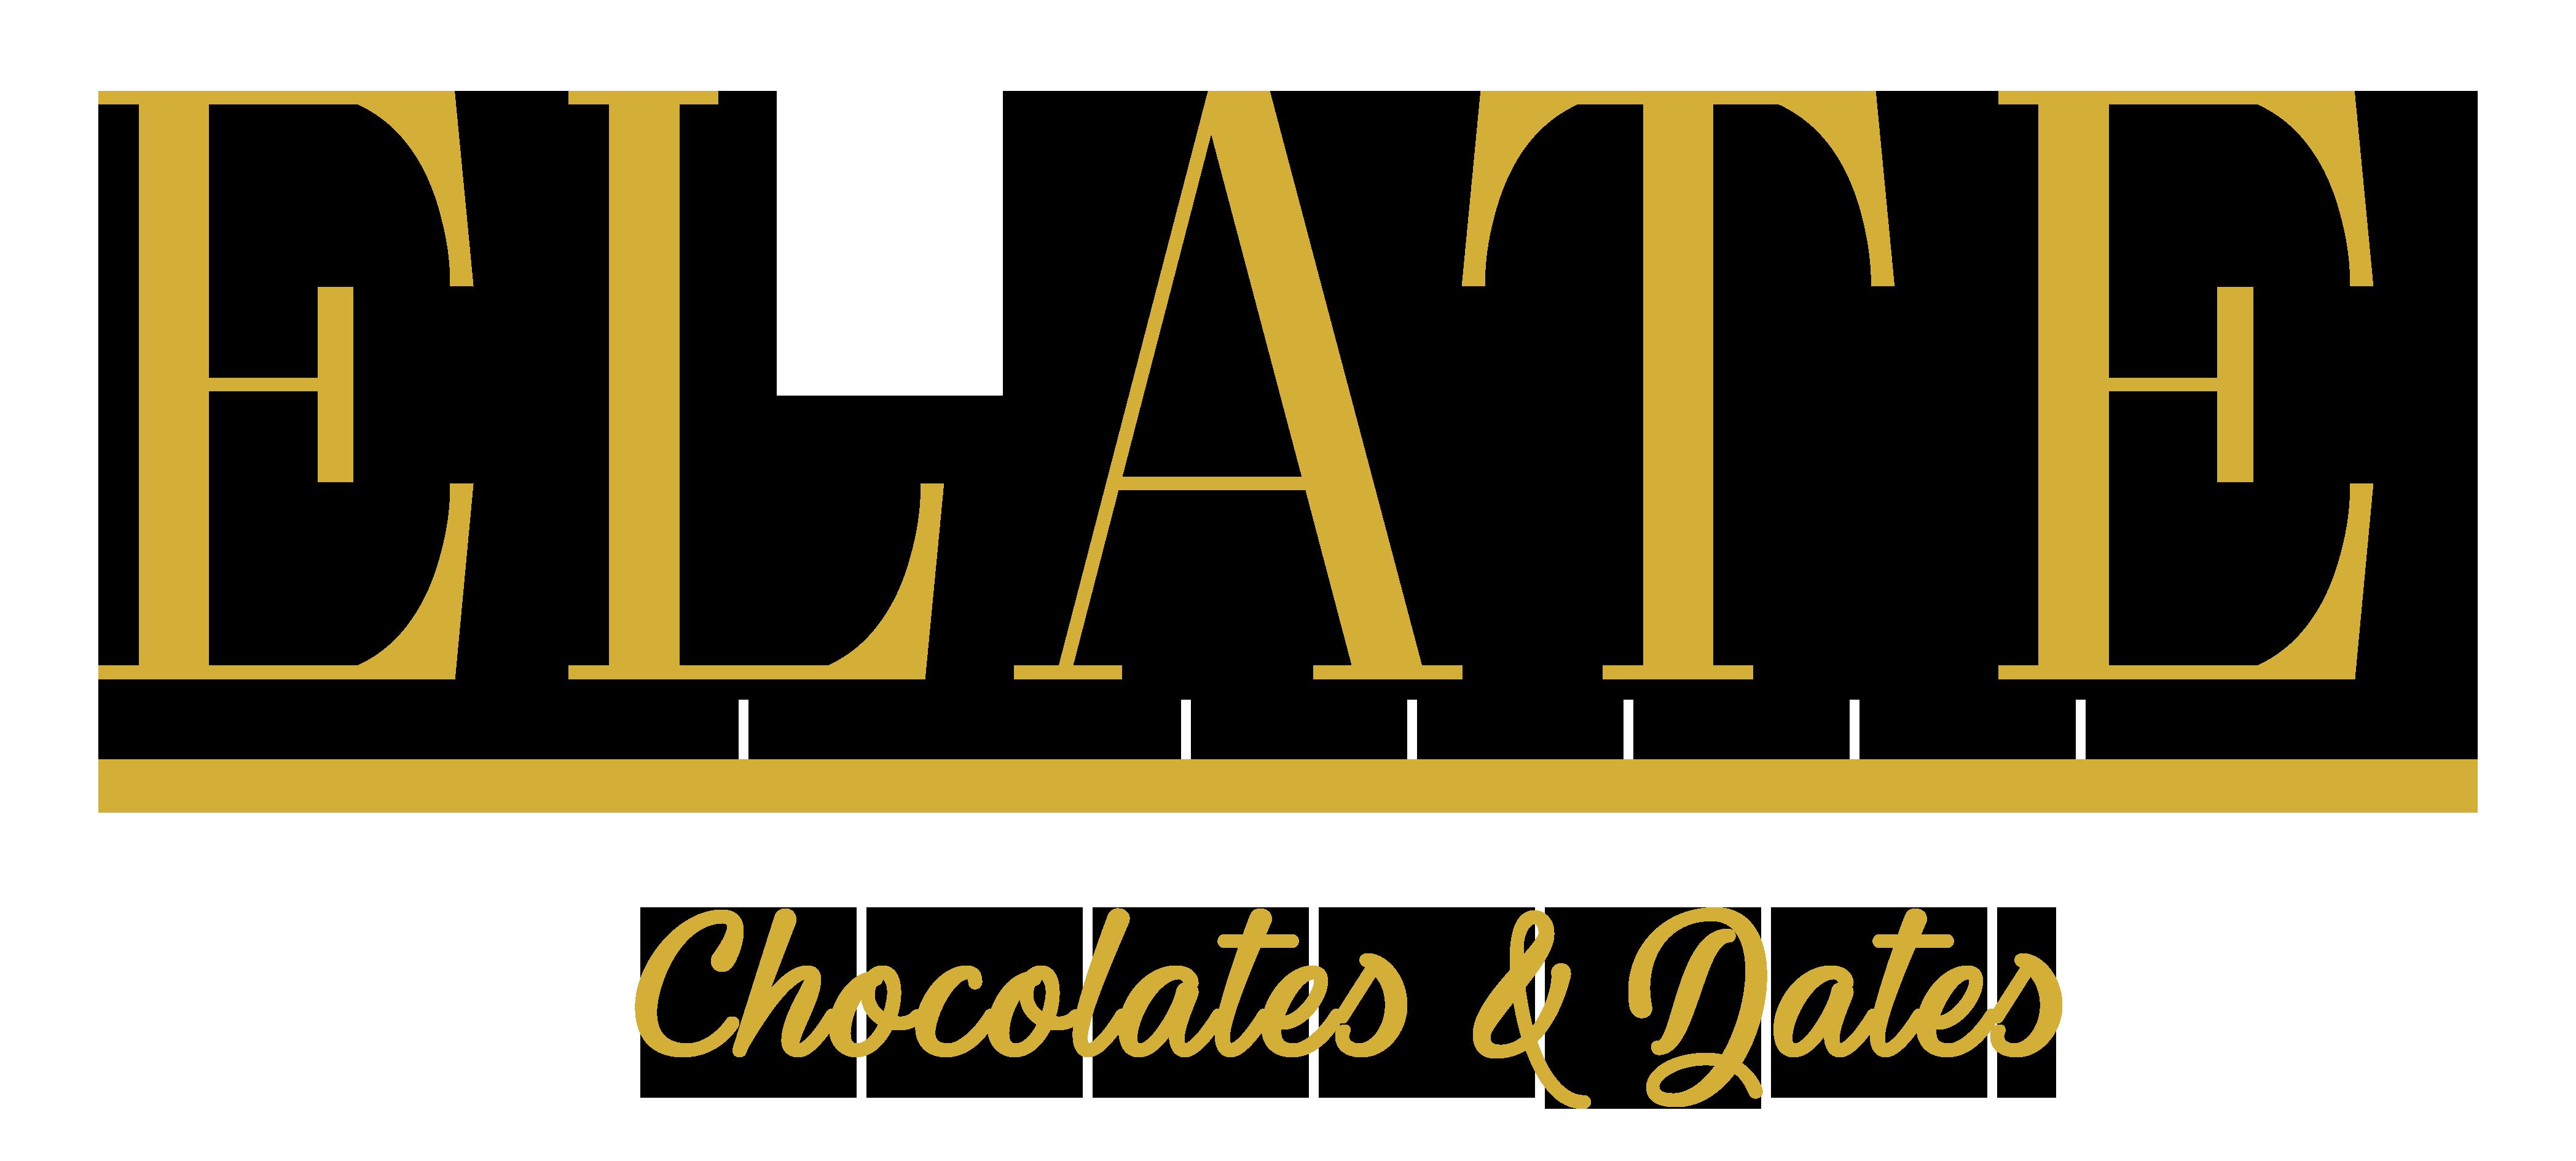 Elate Chocolates and Dates